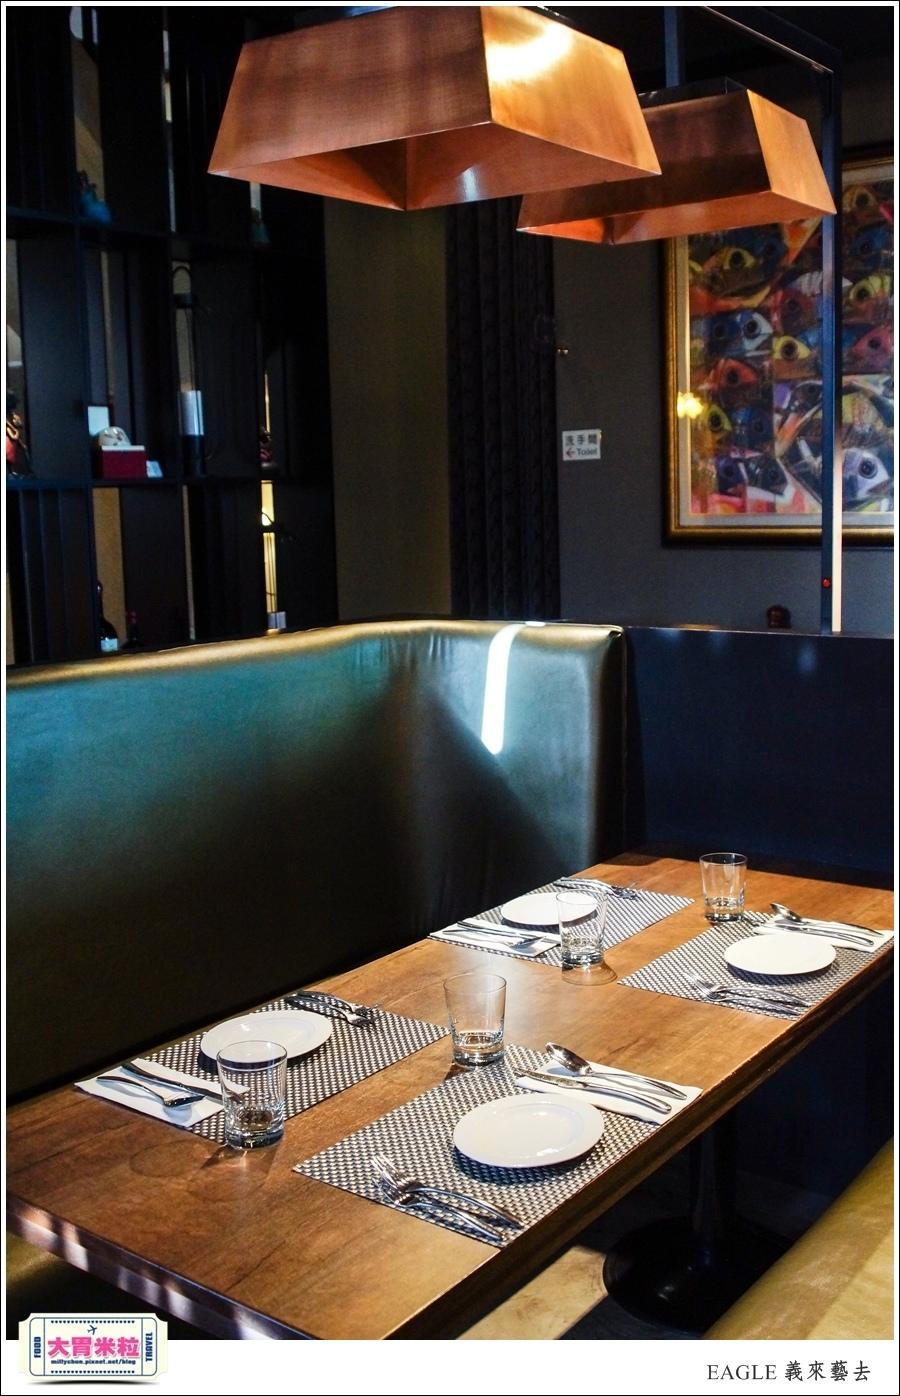 Hellmann's 康寶美玉白汁全台美味沙拉之旅xEAGLE 義來藝去義法餐廳@高雄義法餐廳推薦@大胃米粒0022.jpg